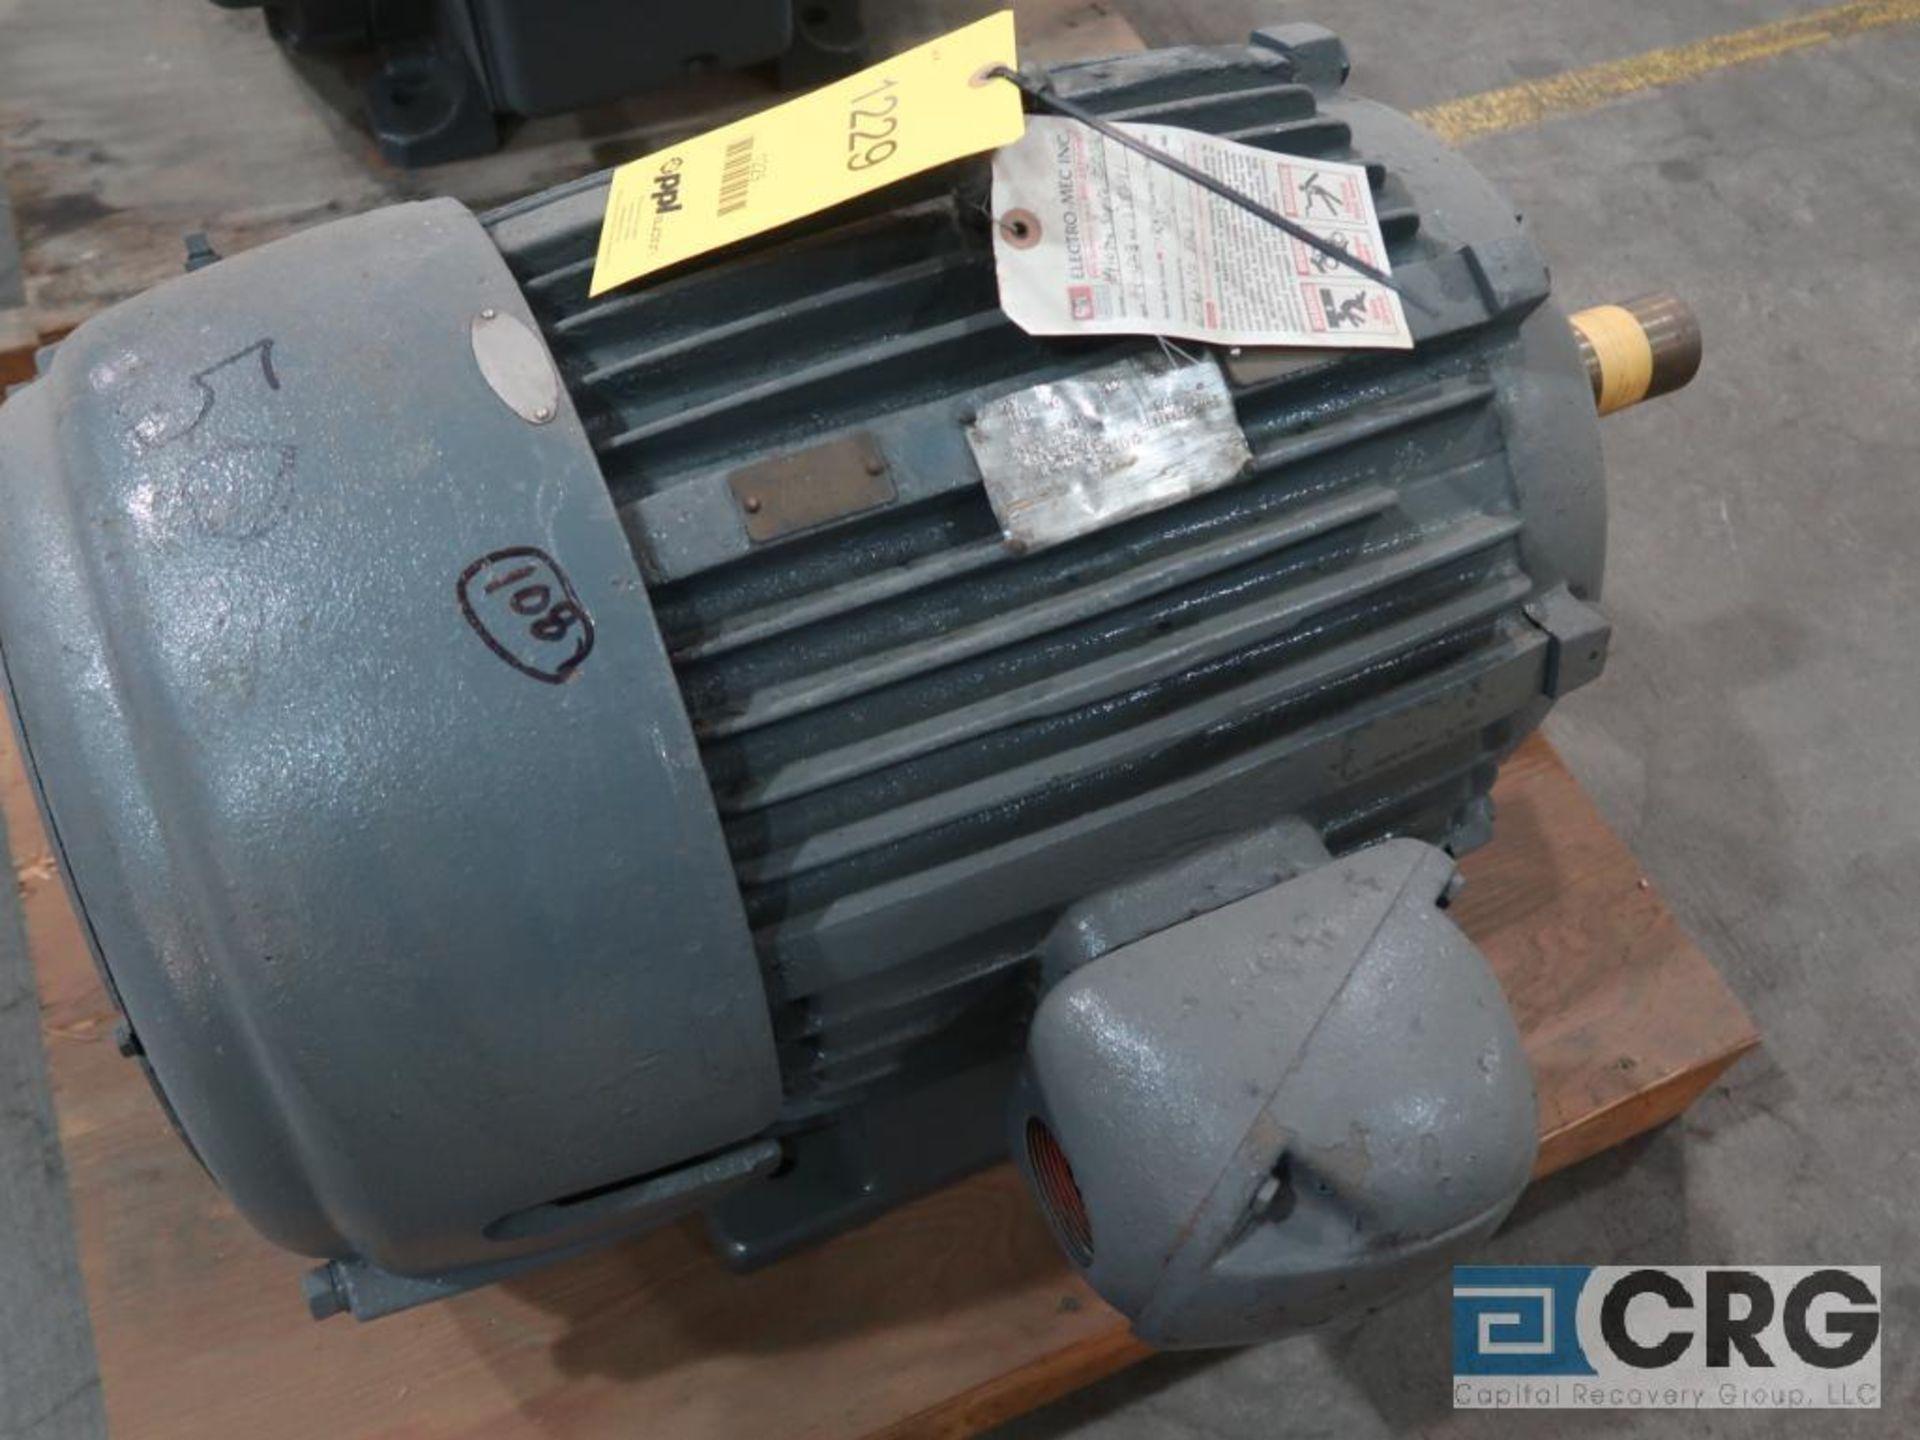 U.S. Electrical Motors electric motor, 50 HP, 1,765 RPMs, 460 volt, 3 ph., 326T frame (Finish